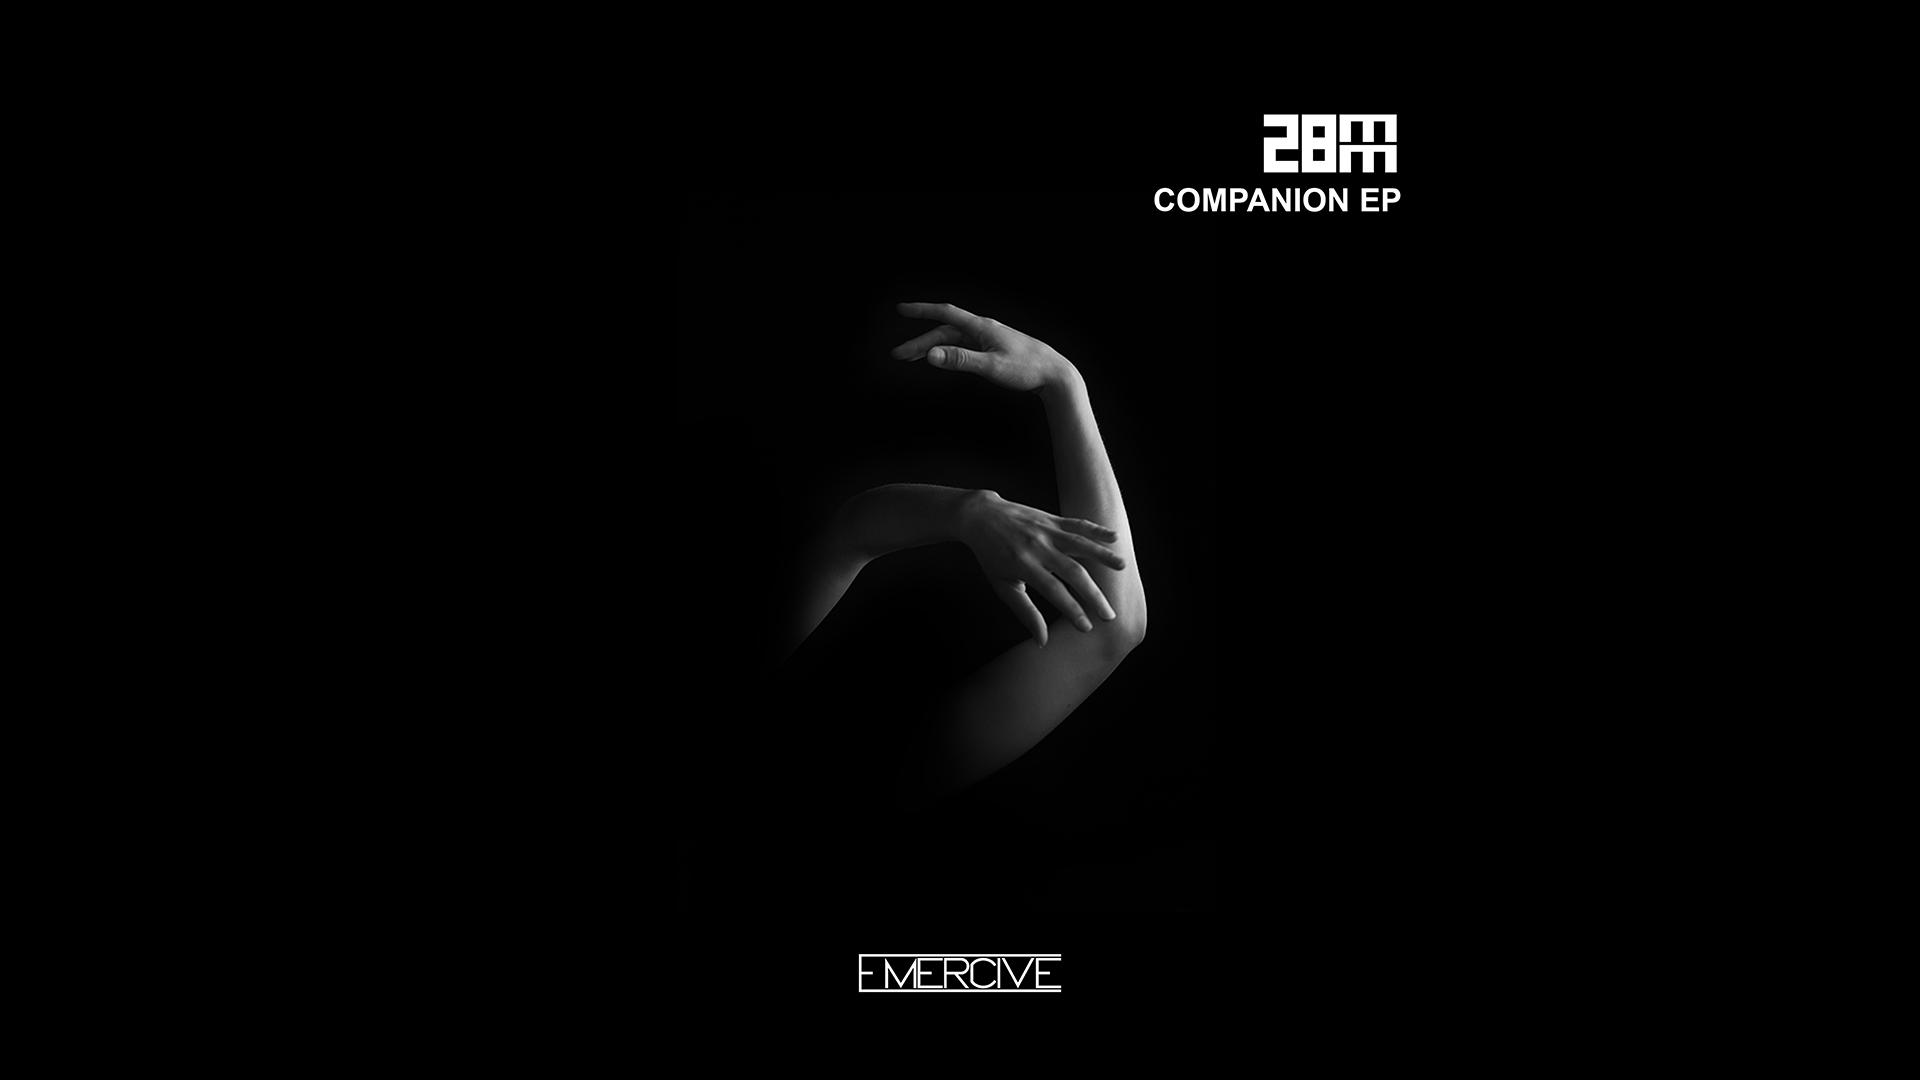 companion_ep_cover_art_16x9.jpg